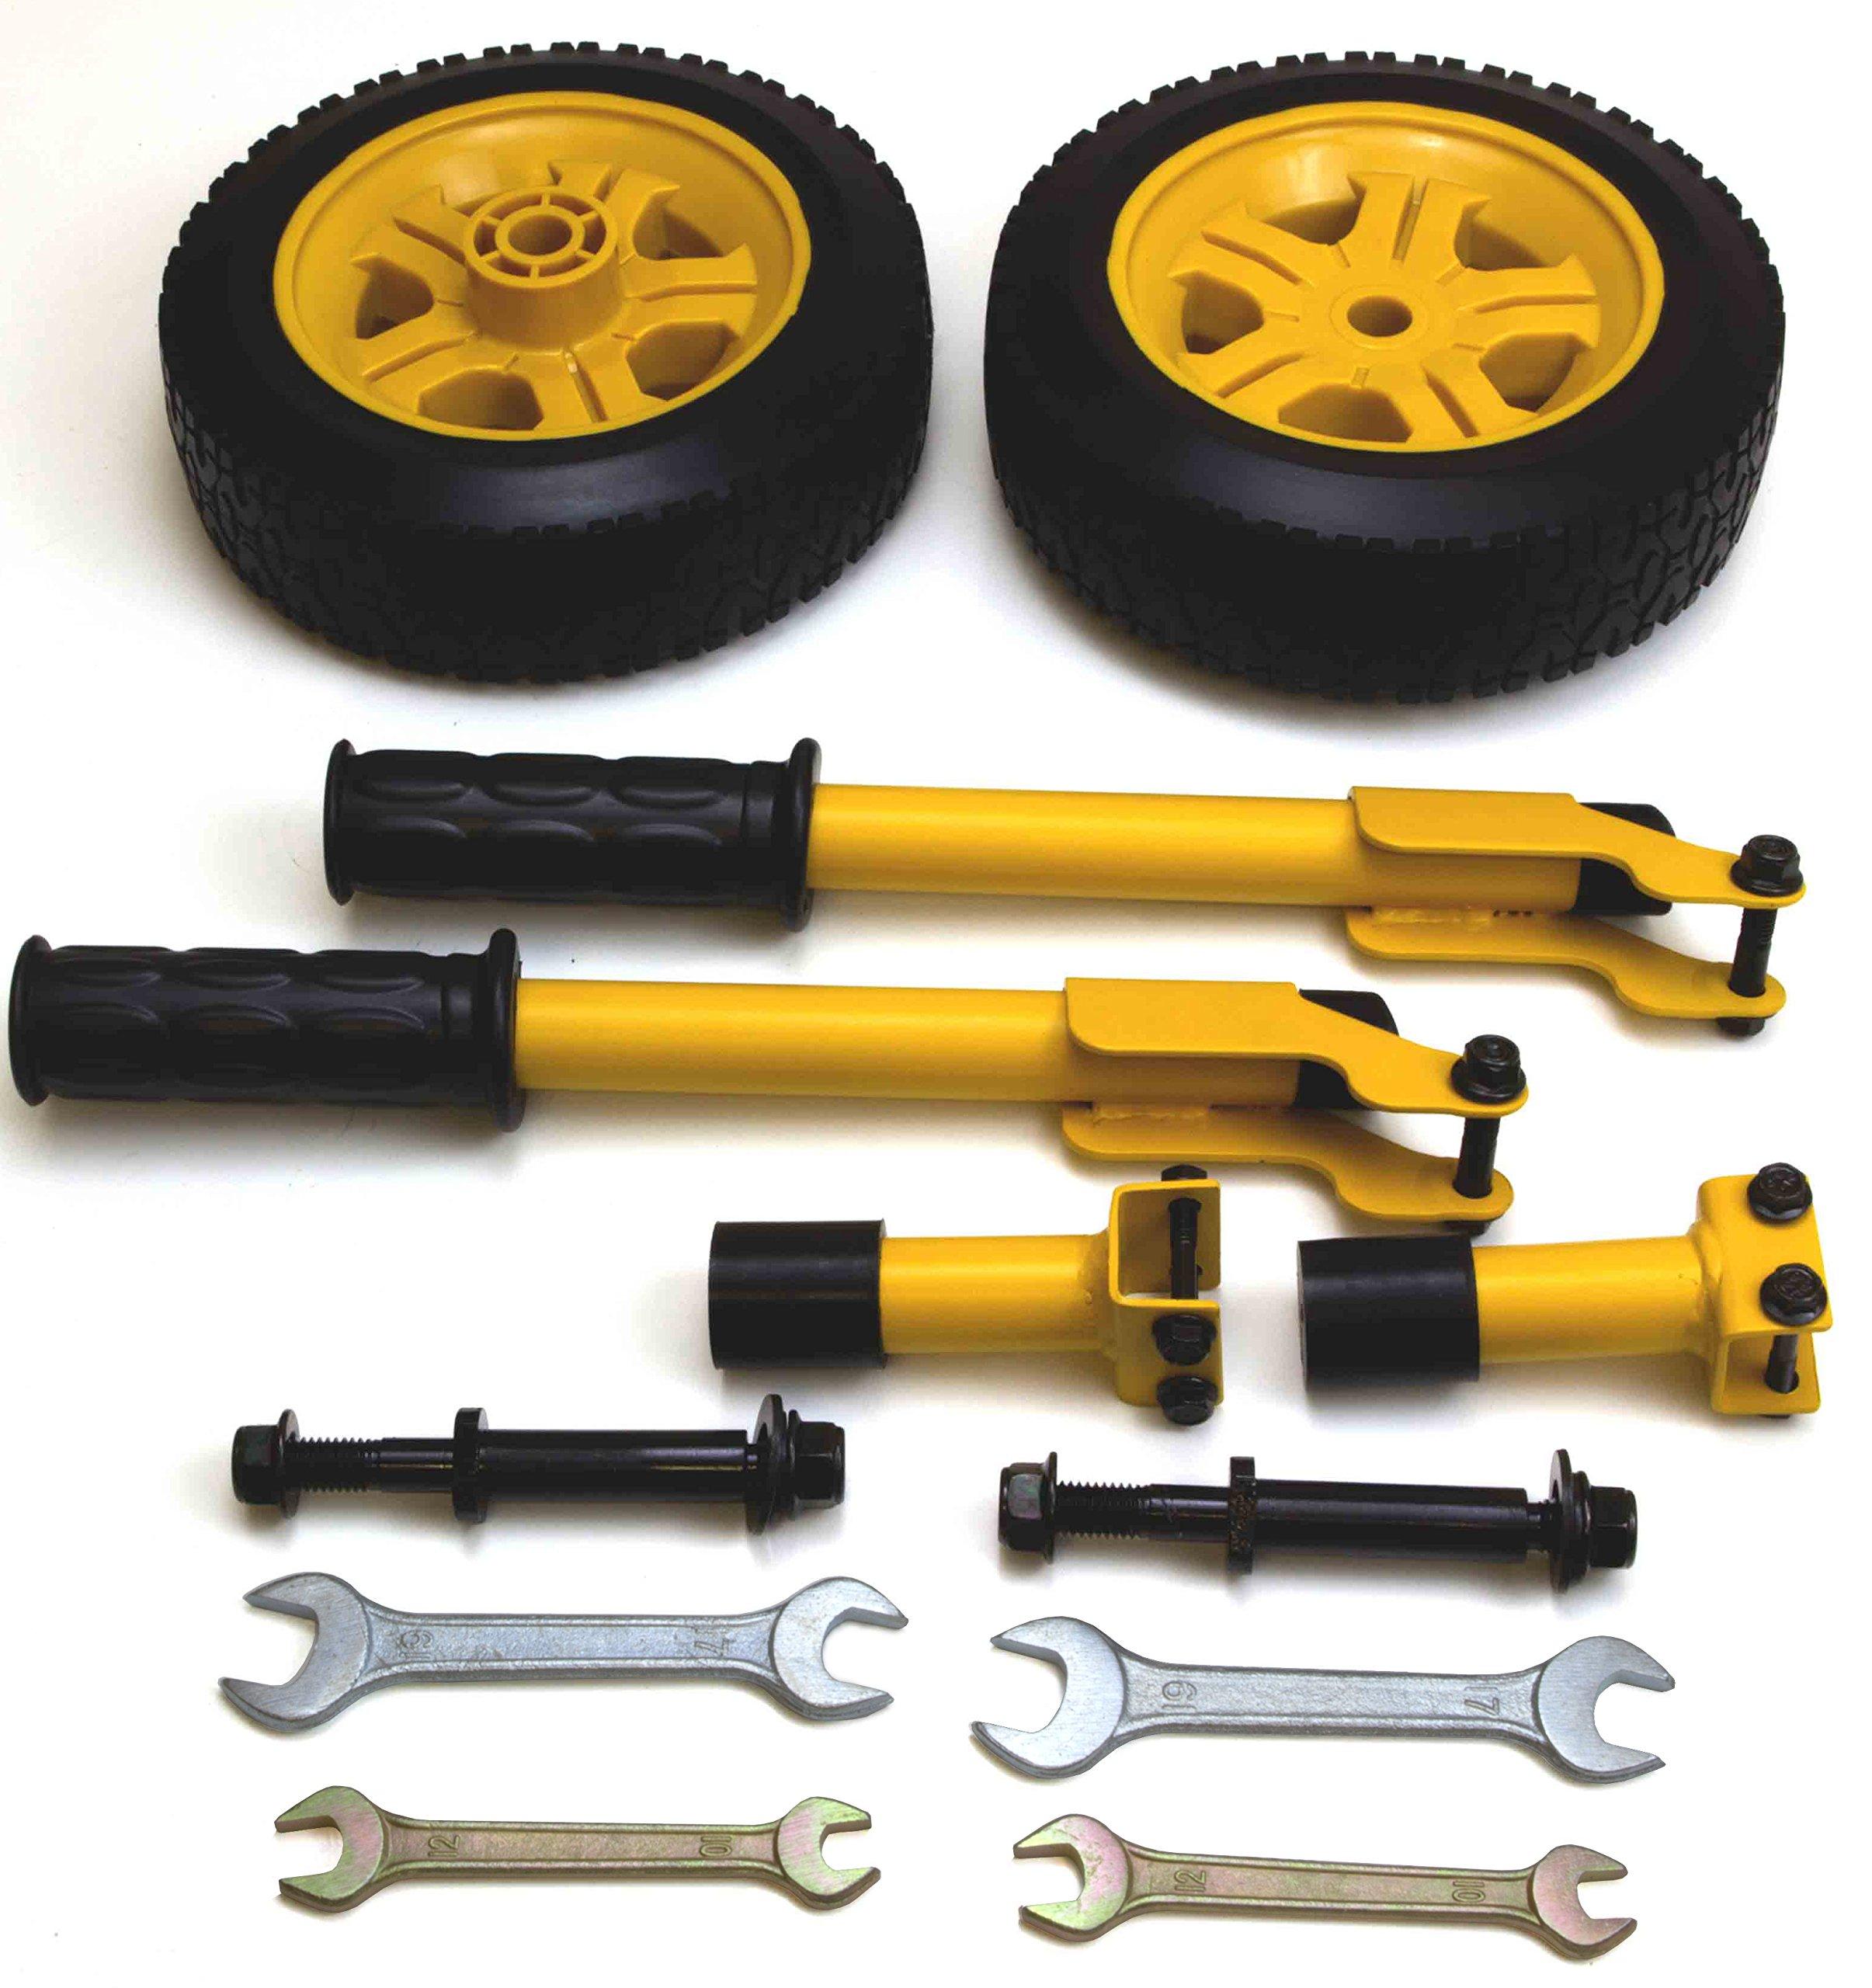 WEN 56410 Generator Wheel and Handle Kit for the 4050-Watt Generator (Model 56400)